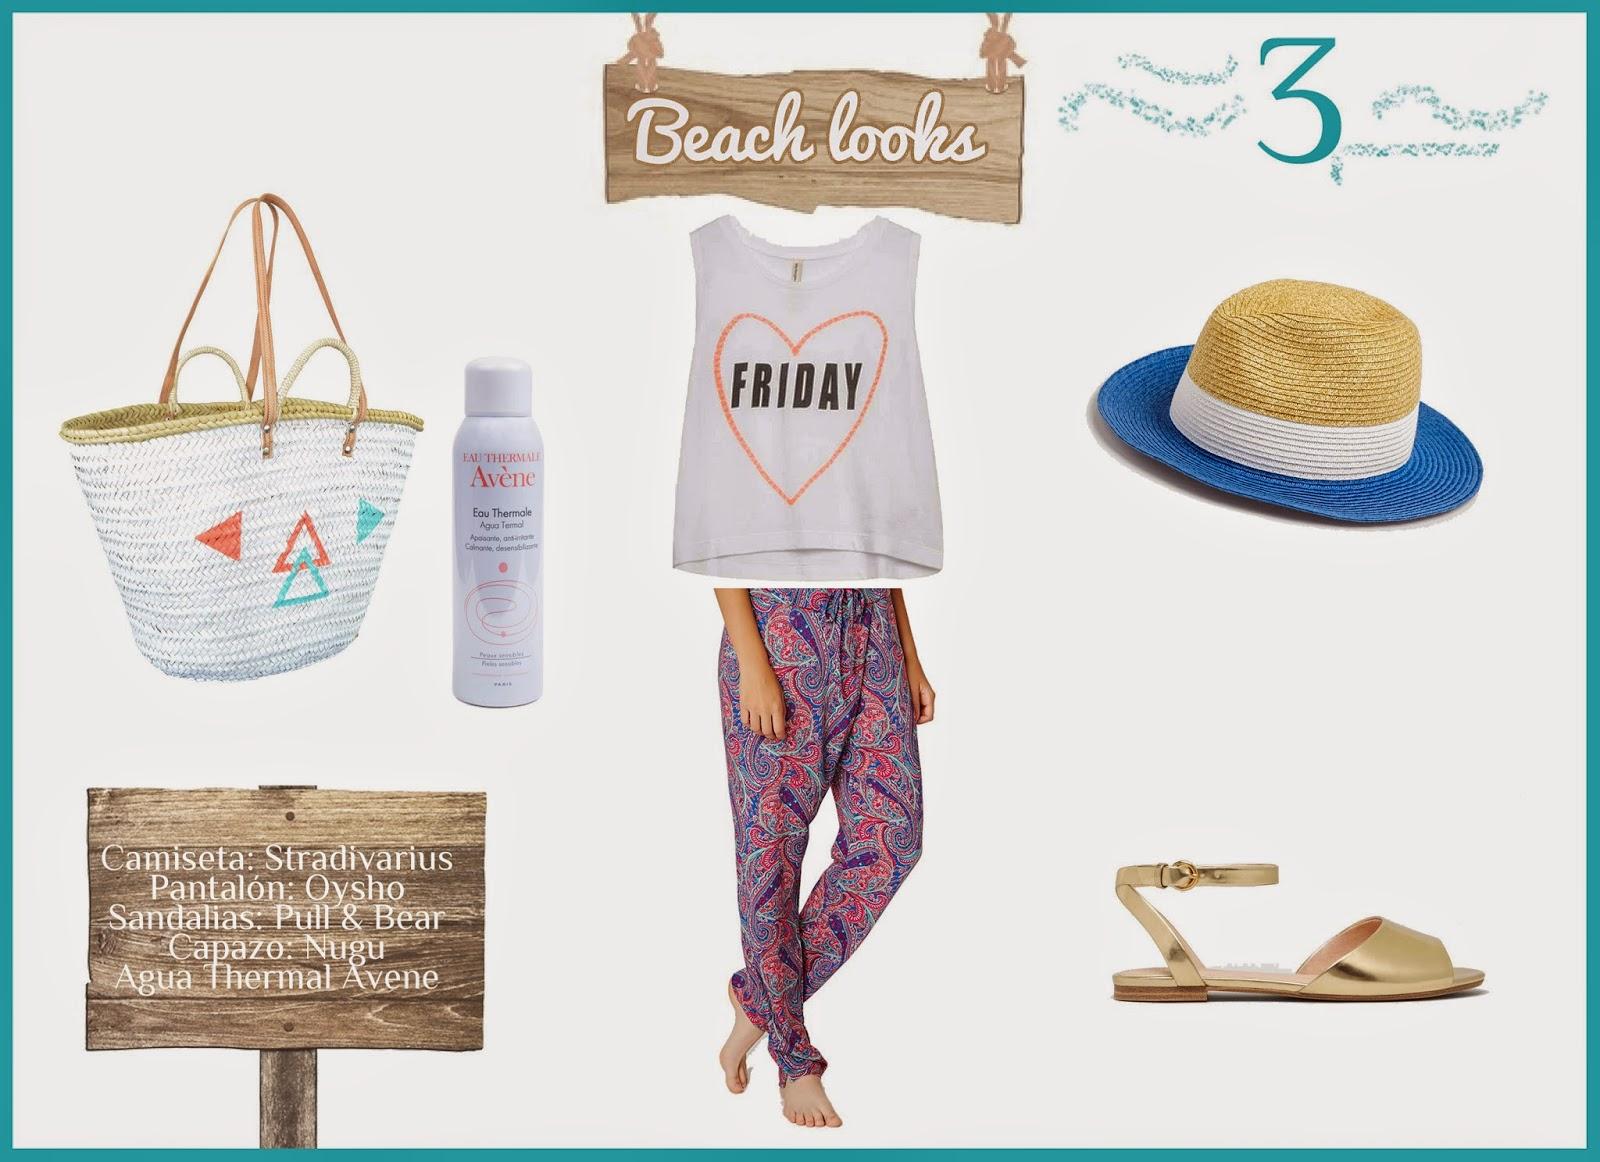 photo-opciones-looks-playa-2014-sombreros_oysho